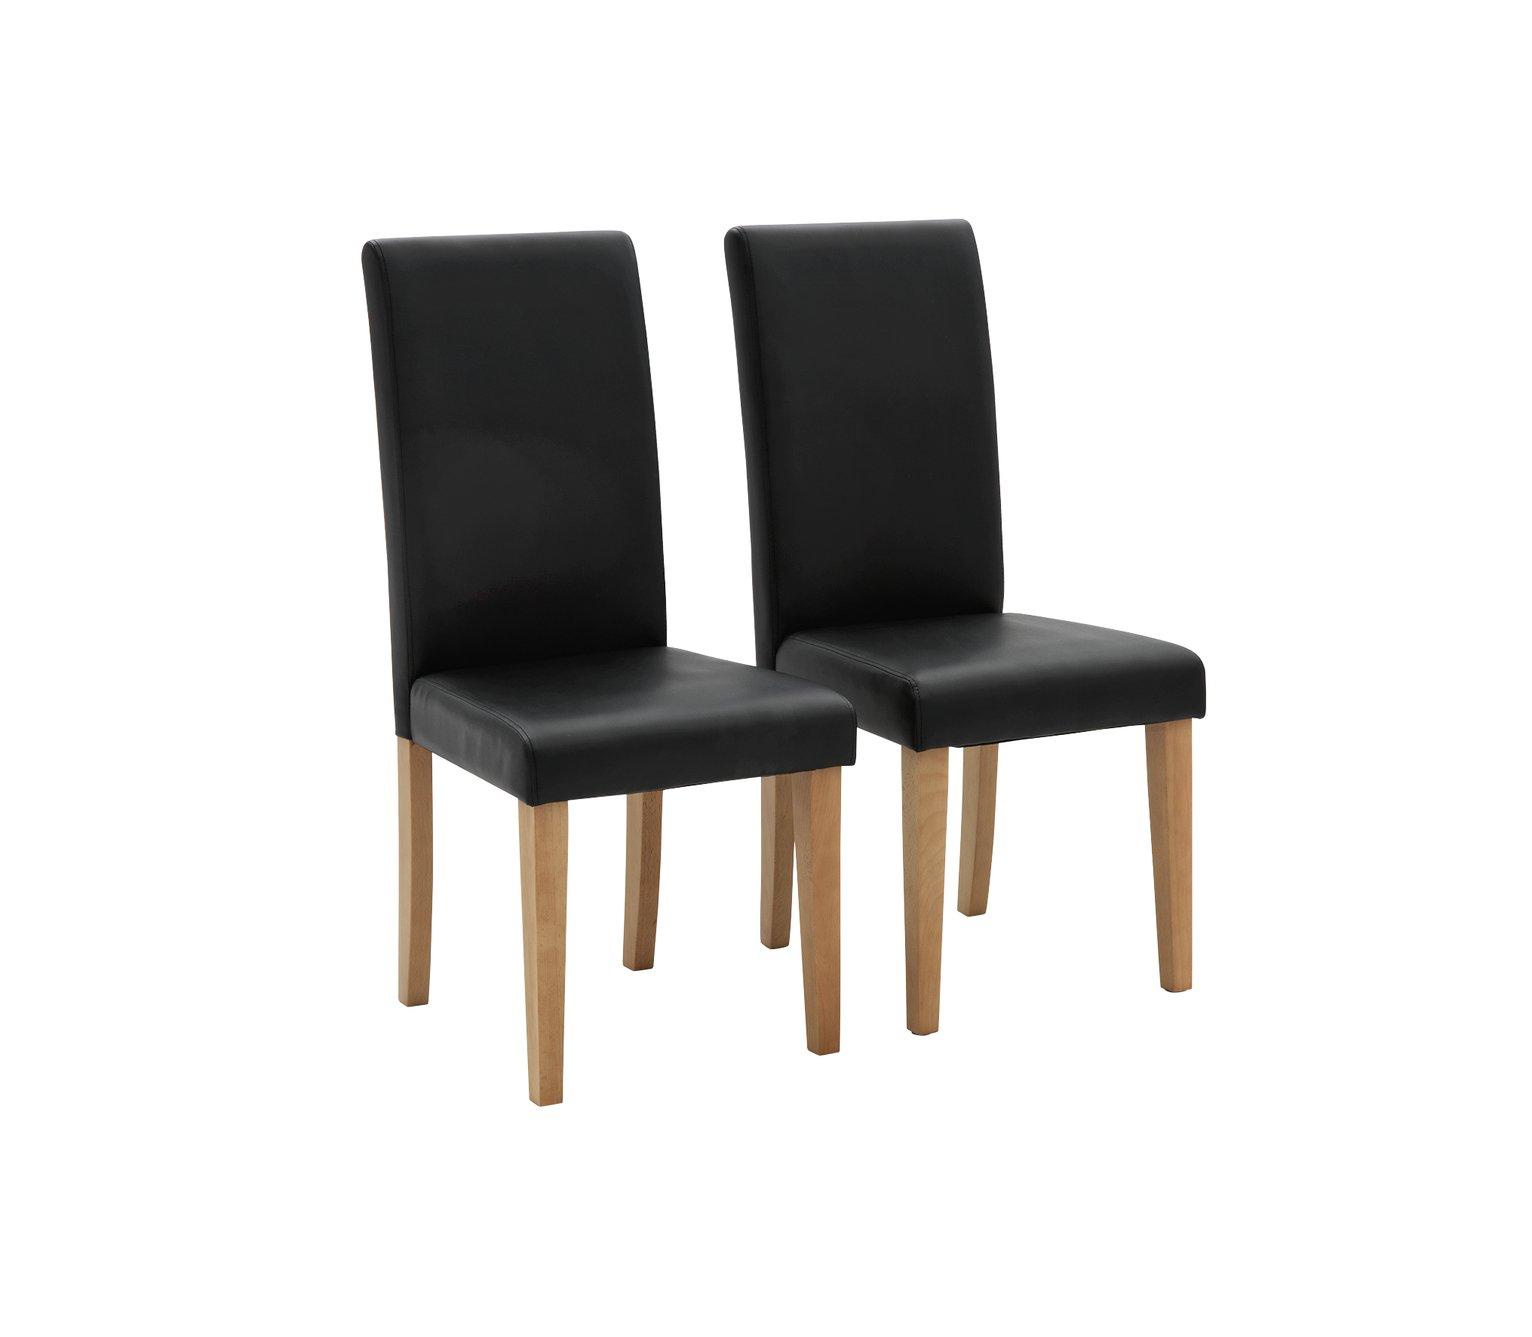 Habitat Pair of Midback Dining Chairs - Black